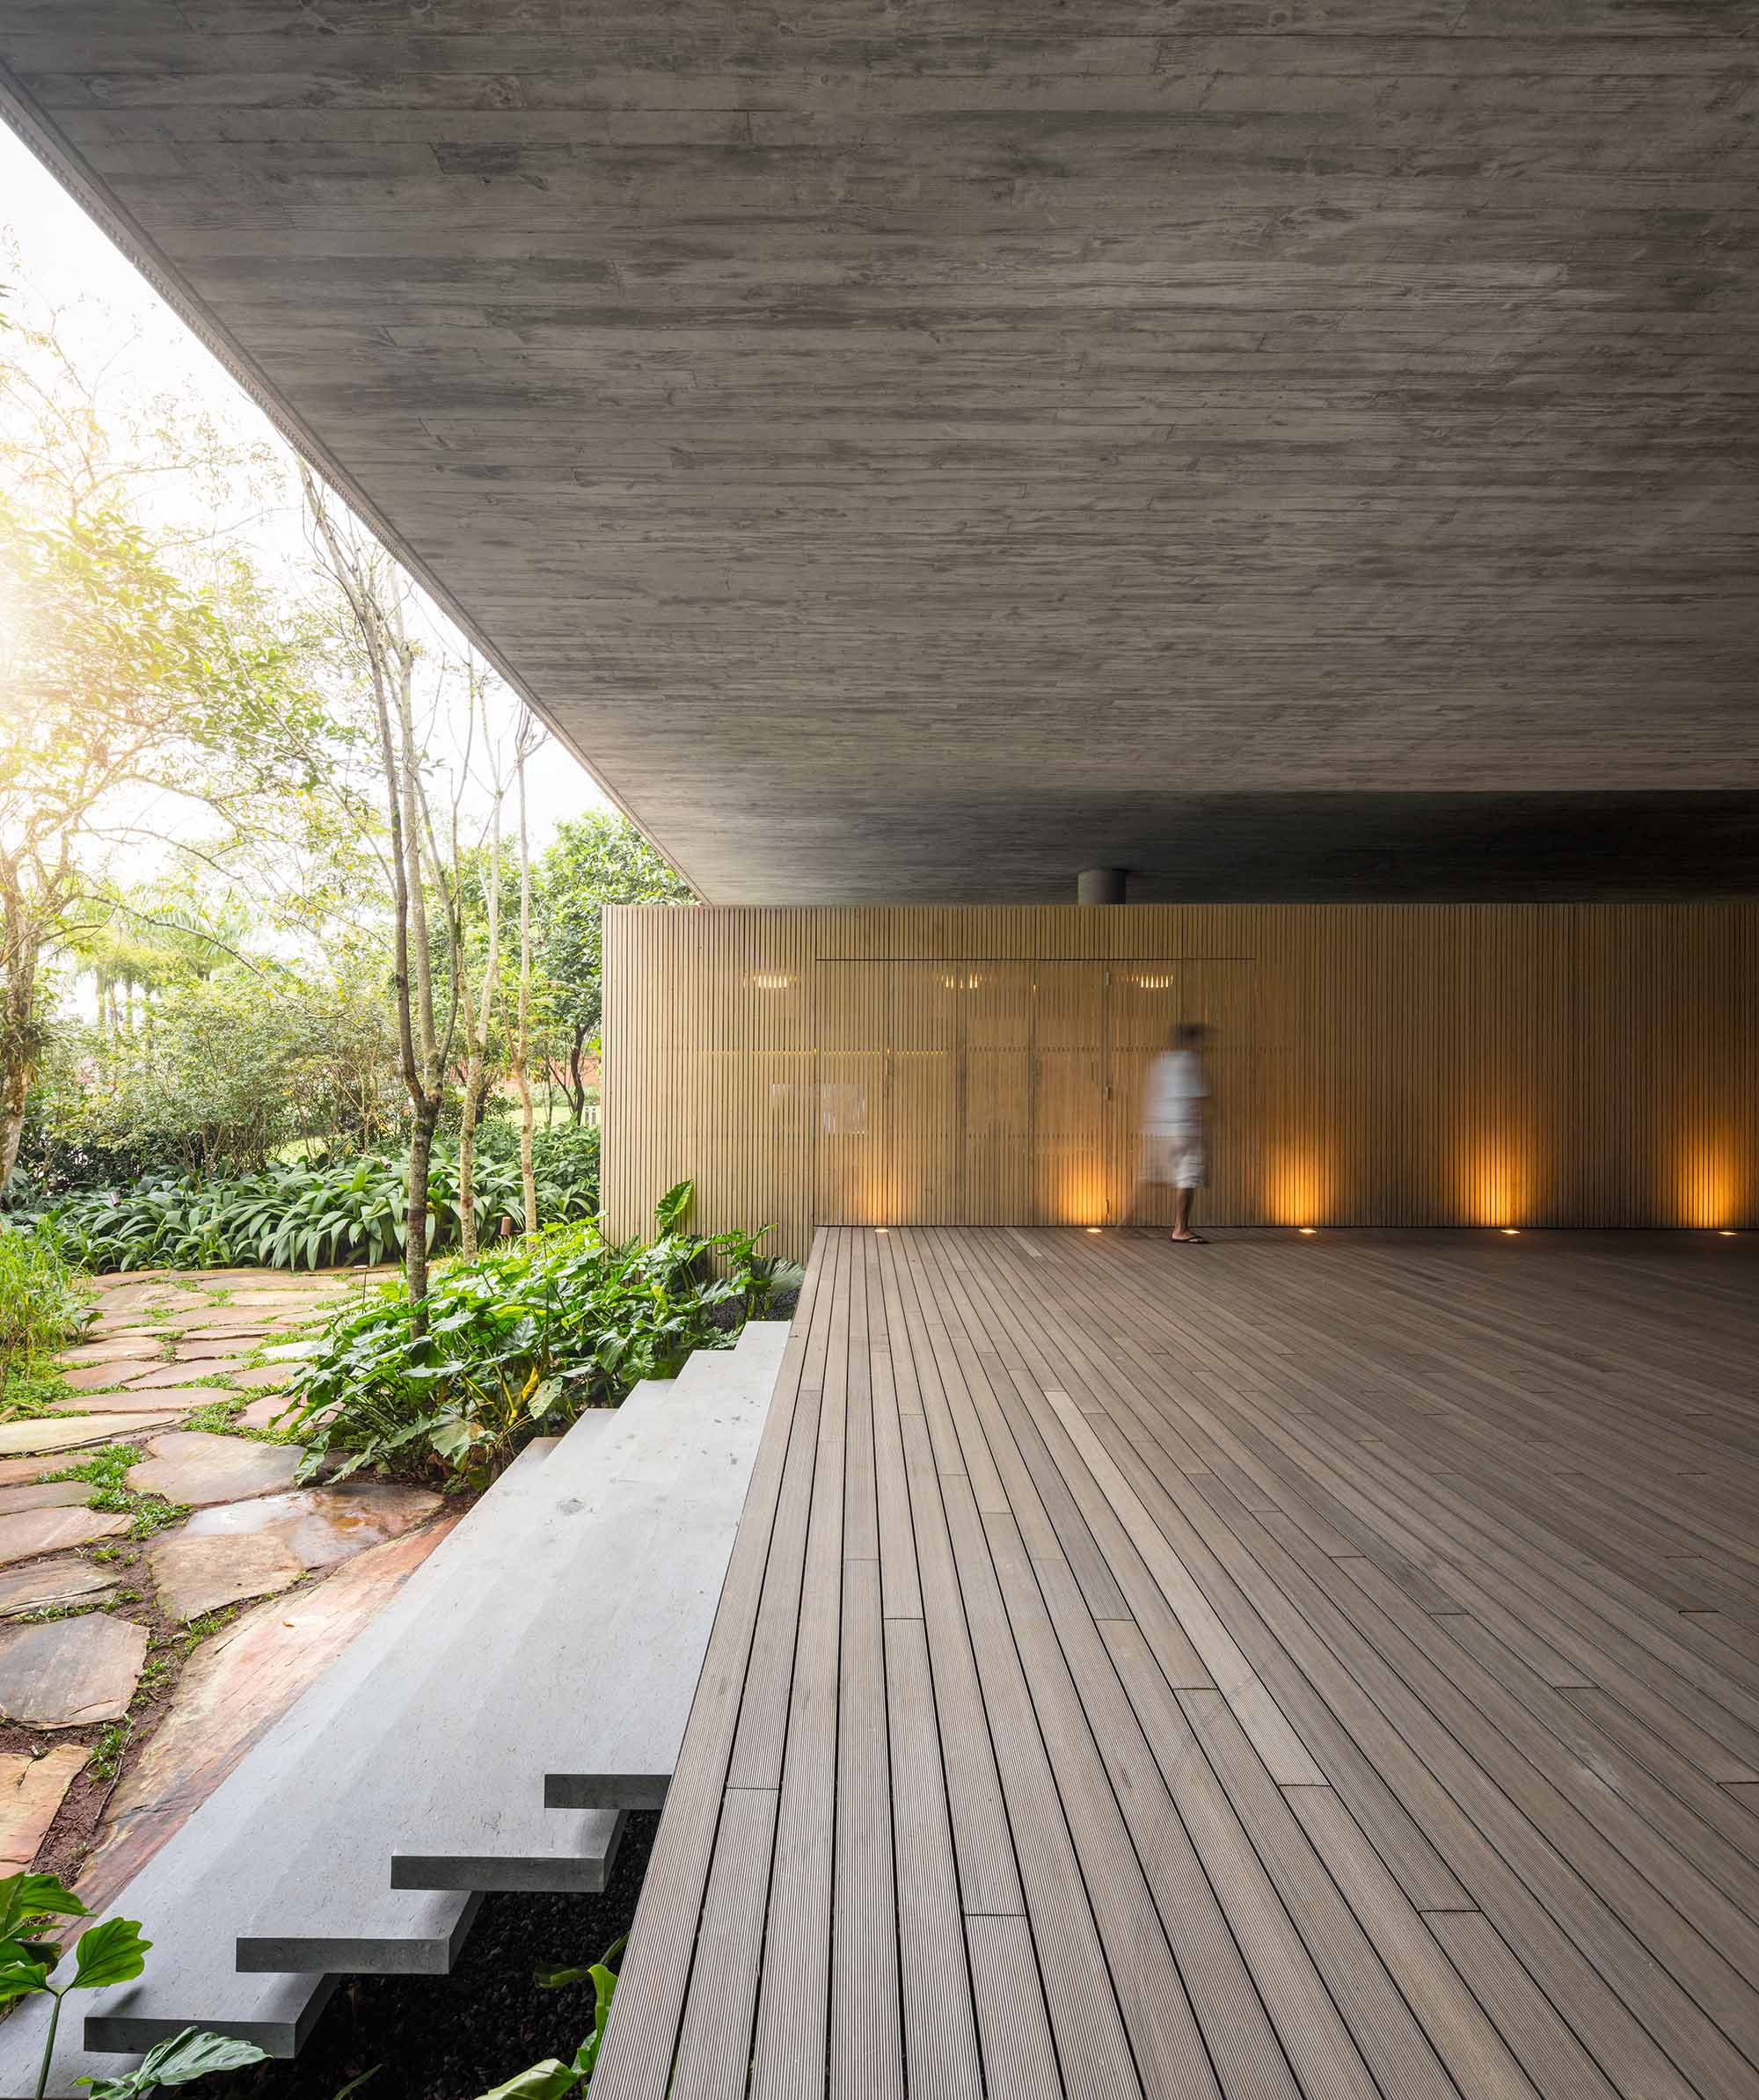 H-House-Life-Jungle-House-Casa-Da-Mata-studio-mk27-mk27_namata_fernandoguerra_medium(8).JPG